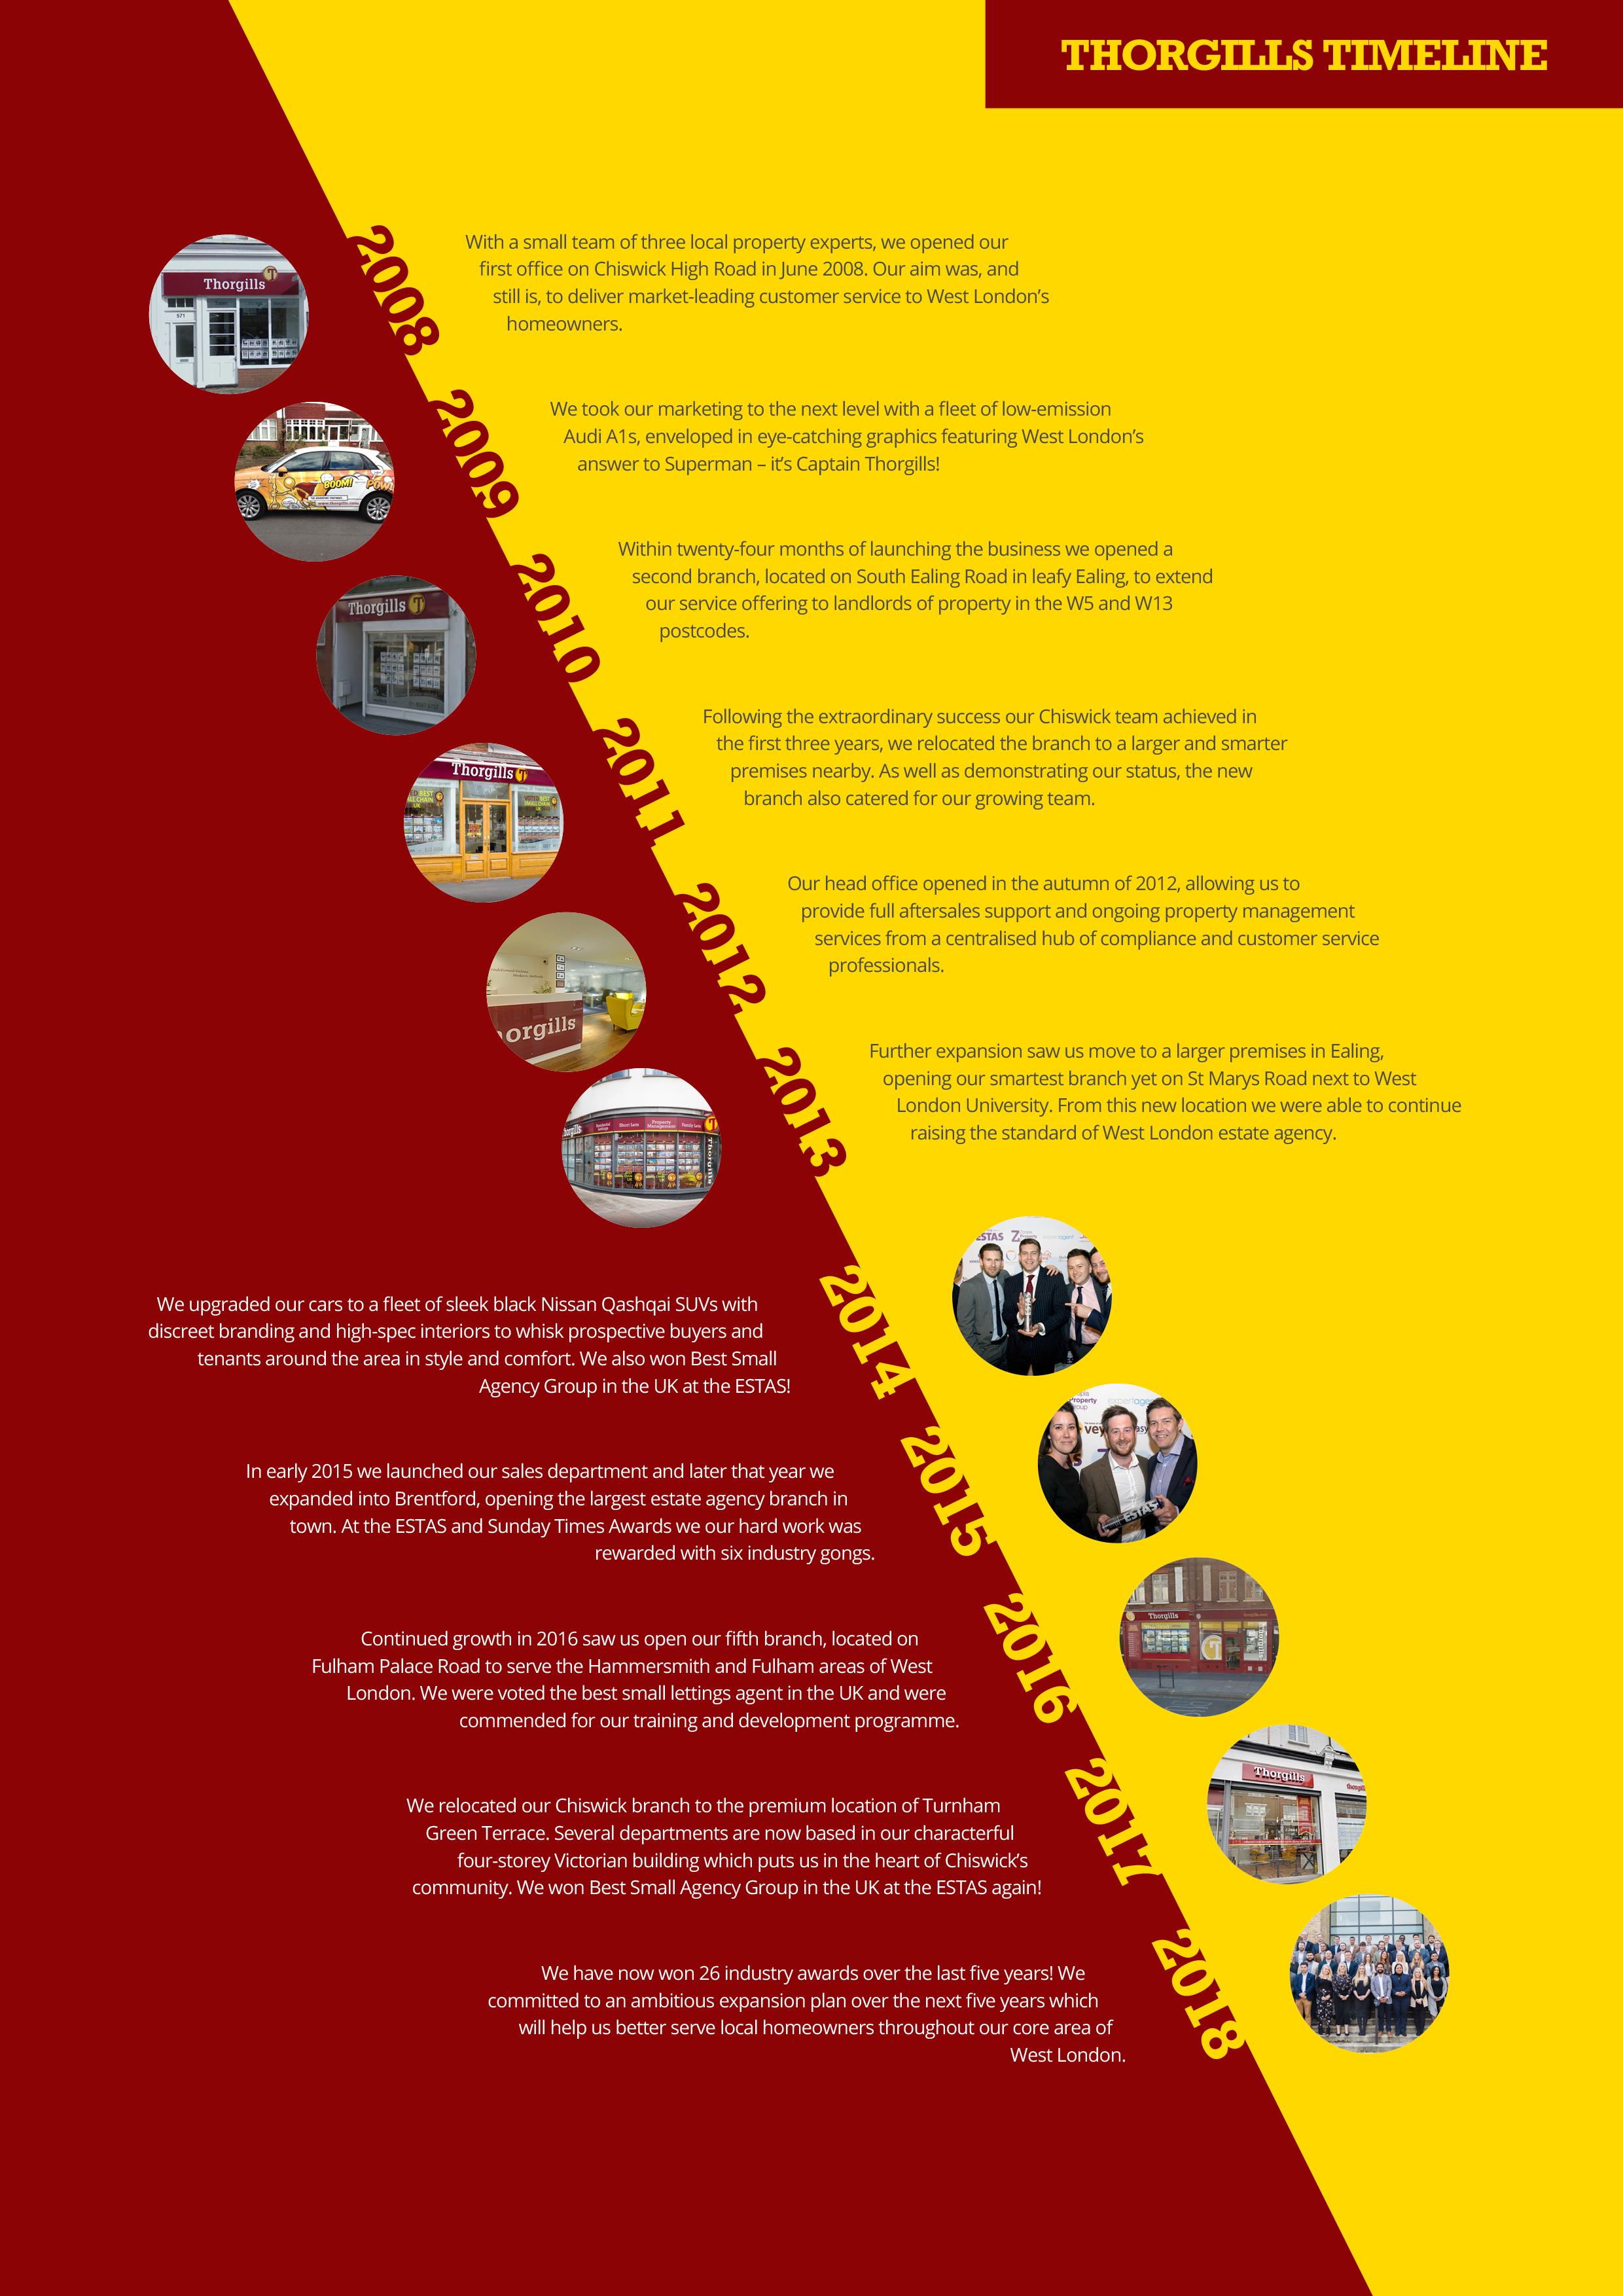 thorgills timeline